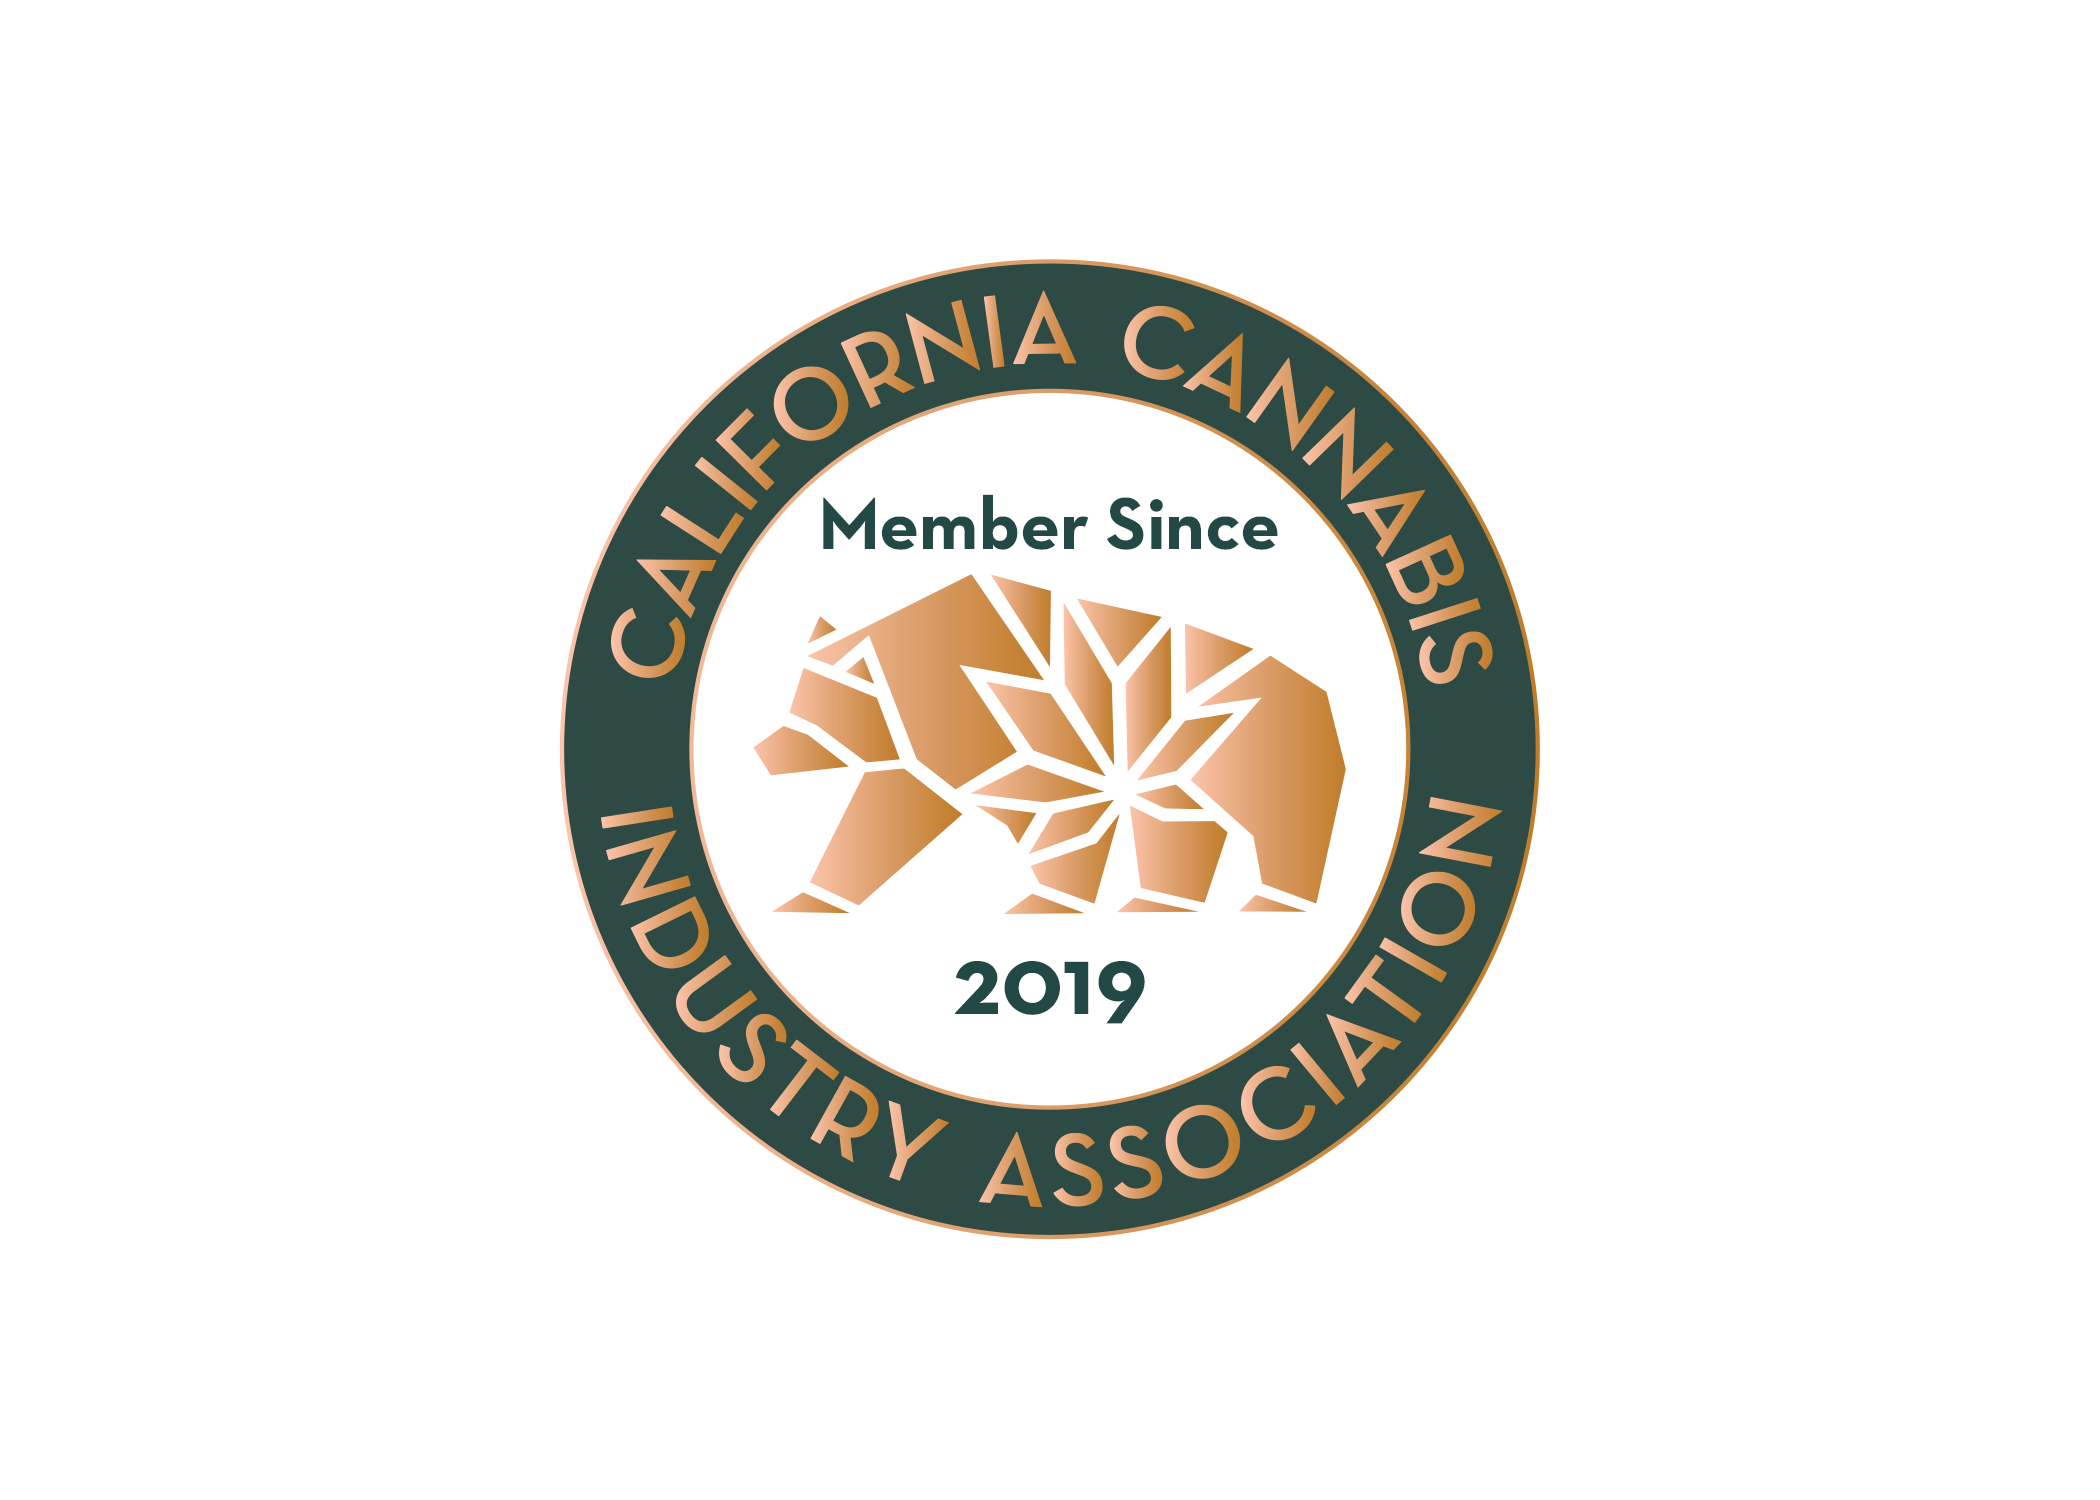 CCIA-Member-Since-2019.png